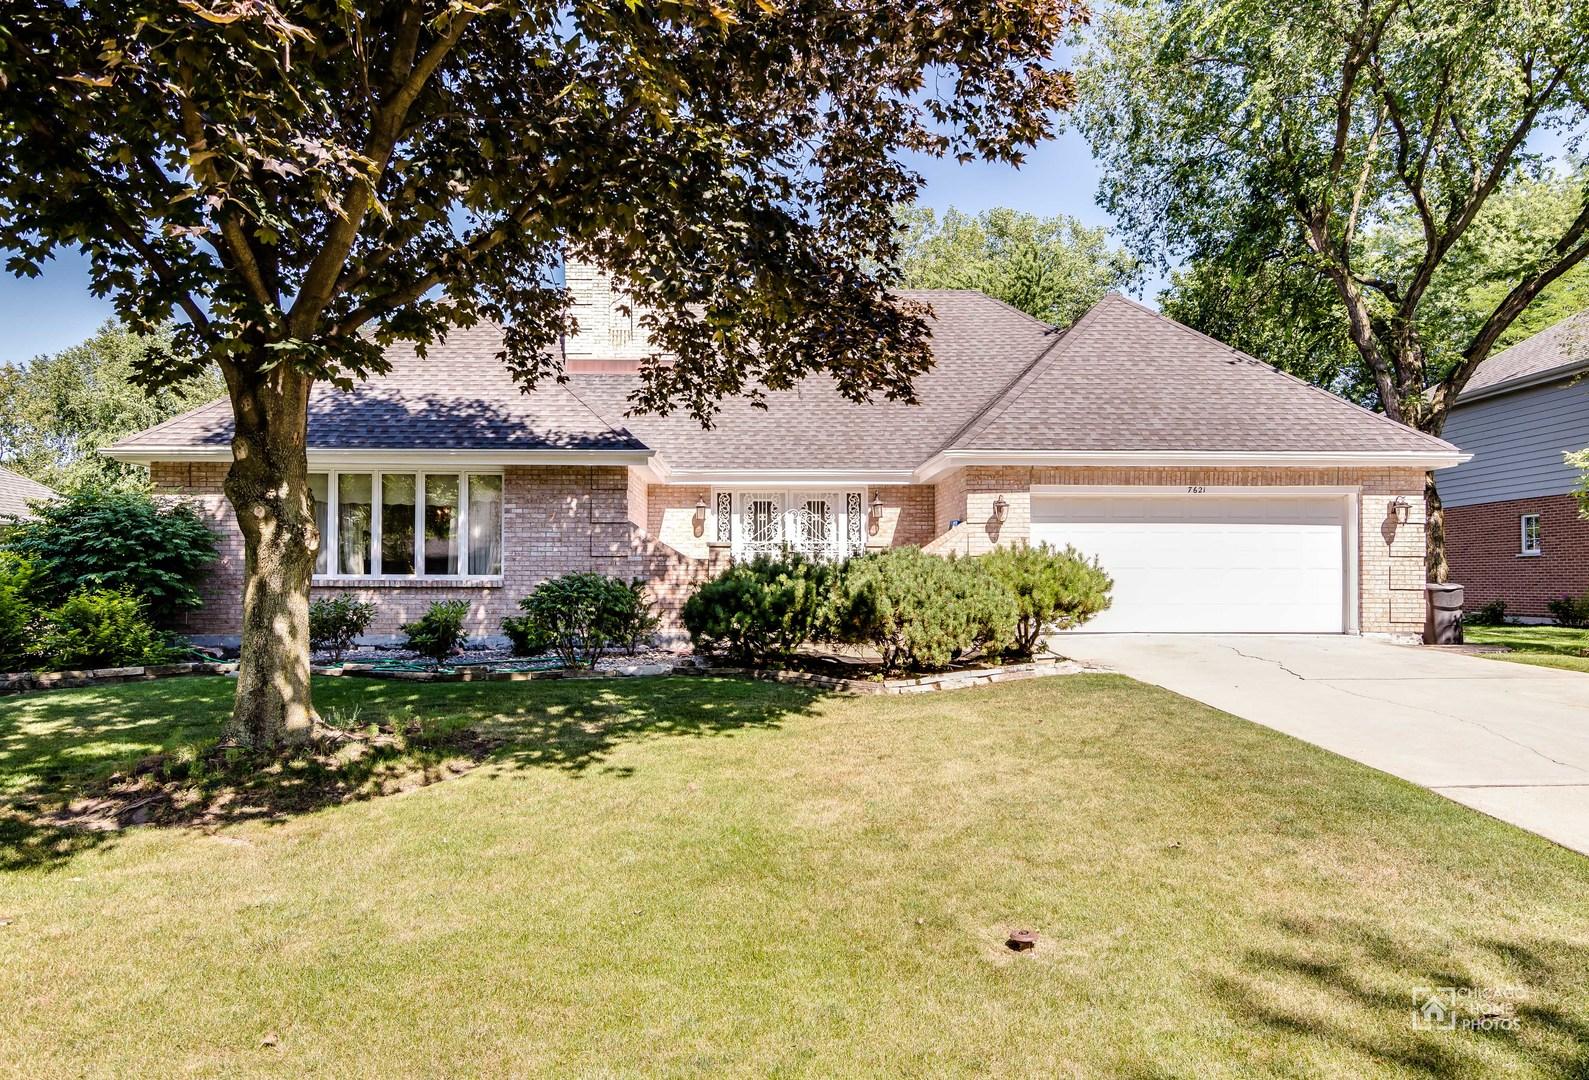 7621 Ridgewood Lane, Burr Ridge, Illinois